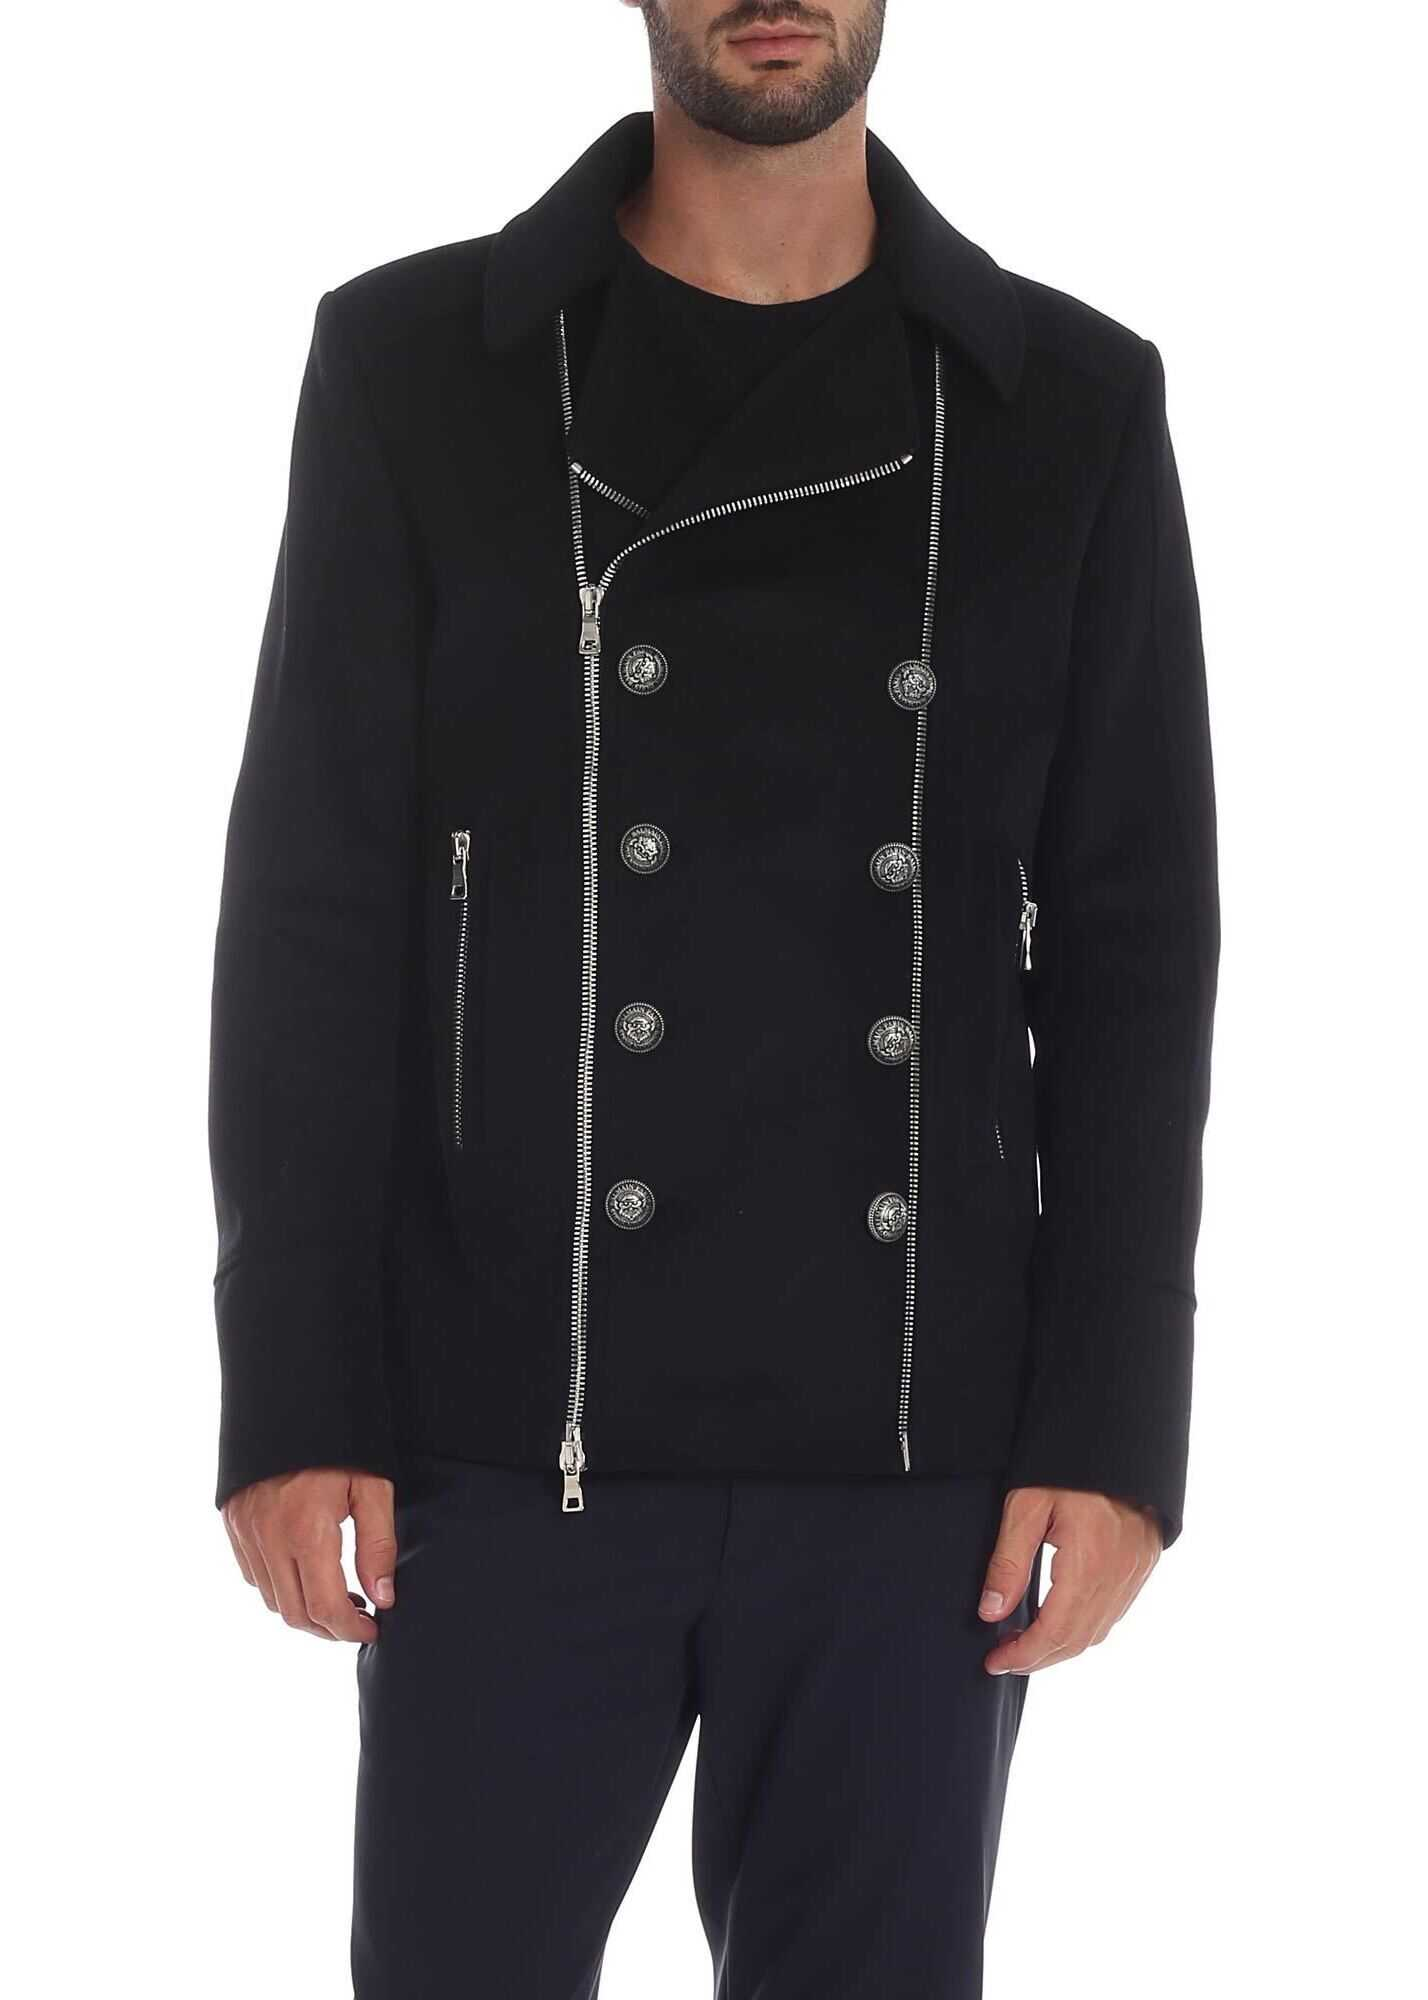 Balmain Black Jacket With Logo Buttons Black